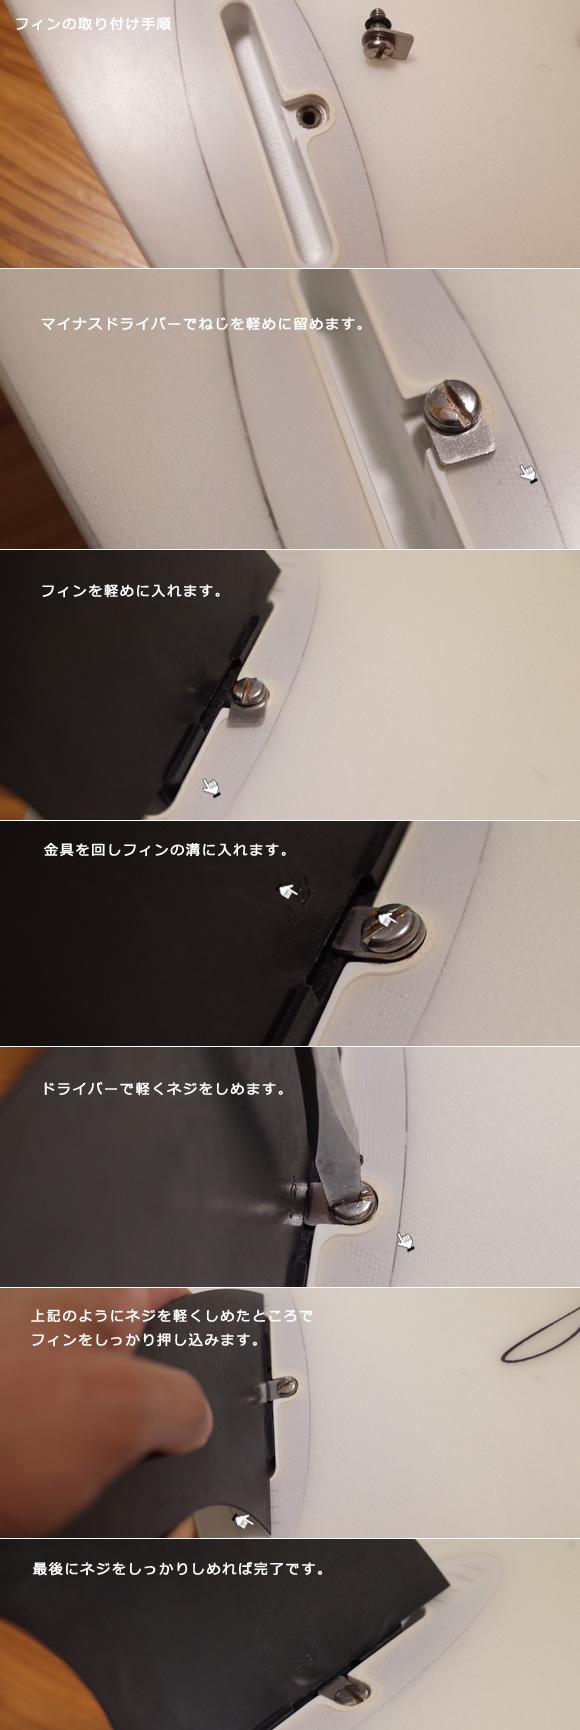 SHINTAROW SHAPES SHINNYサーフボード 中古ショートボード 6`3 finの取り付け手順 No.96291489